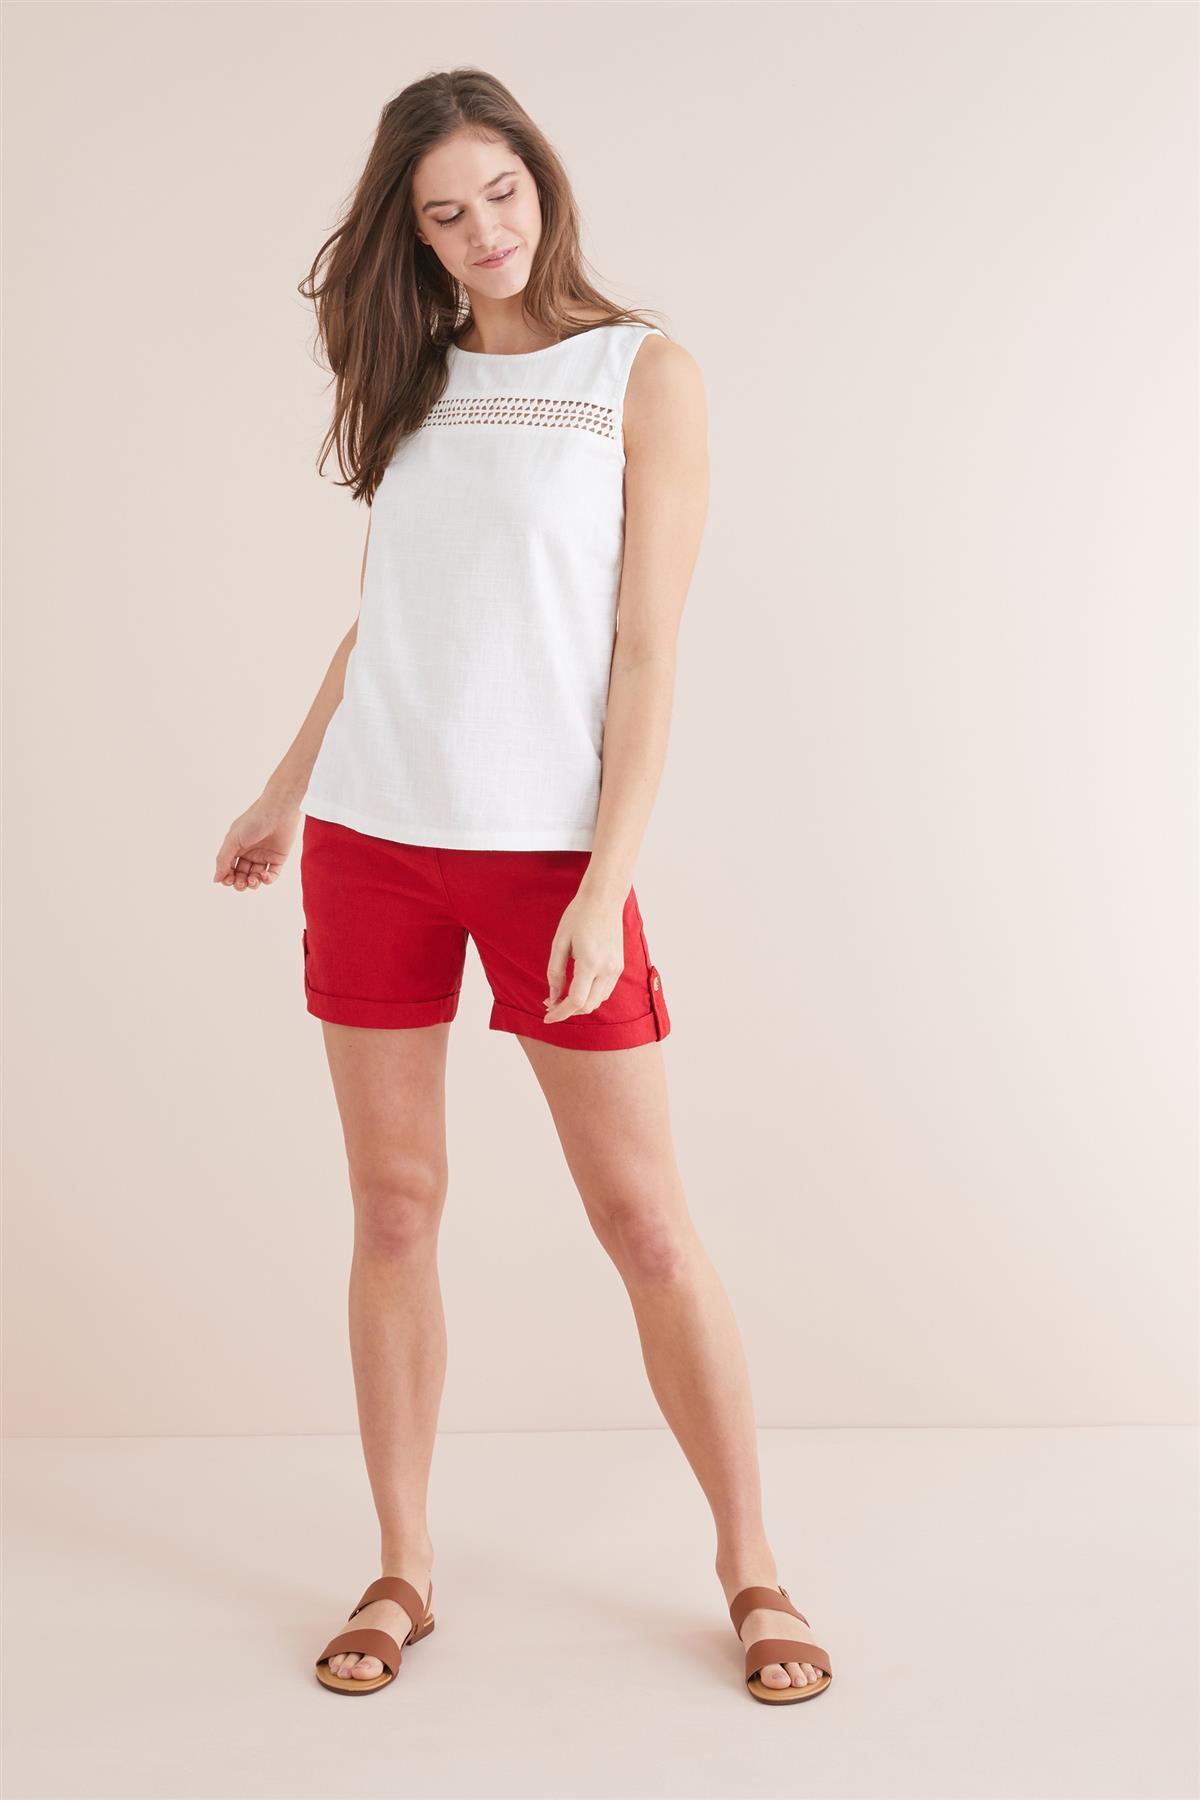 NEXT-Womens-Linen-Sleeveless-Boxy-Top-SALE-RRP-18 thumbnail 22